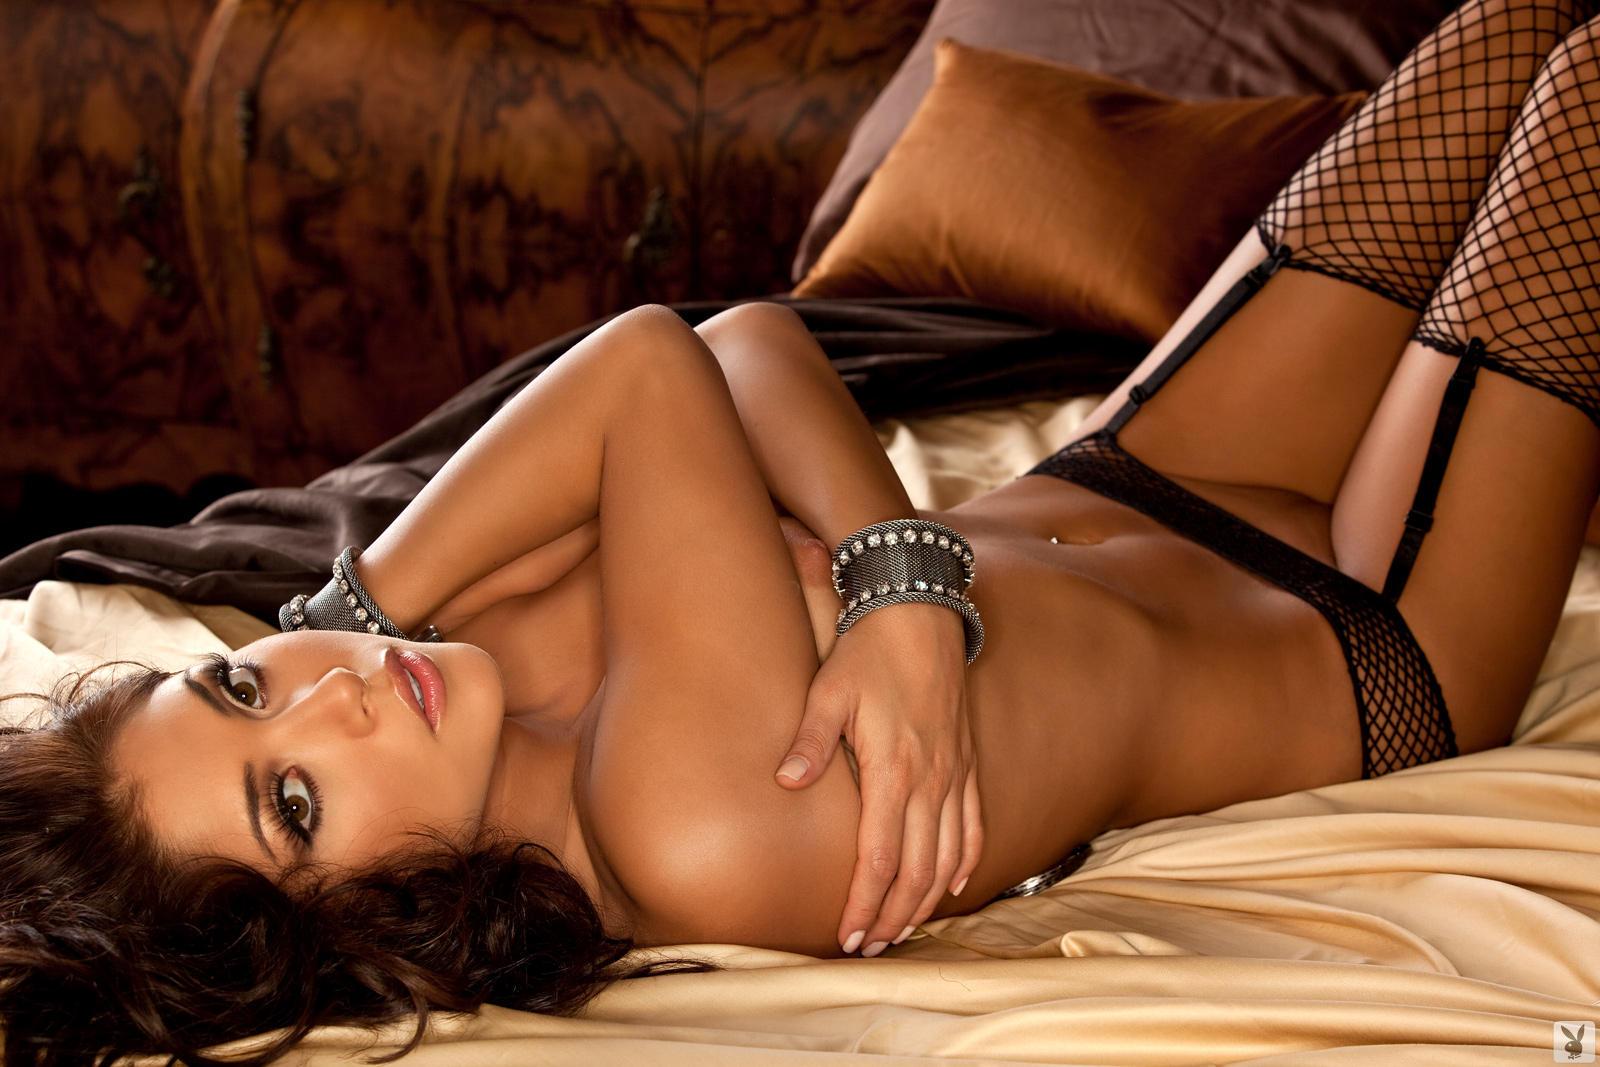 Arianny celeste sexy topless